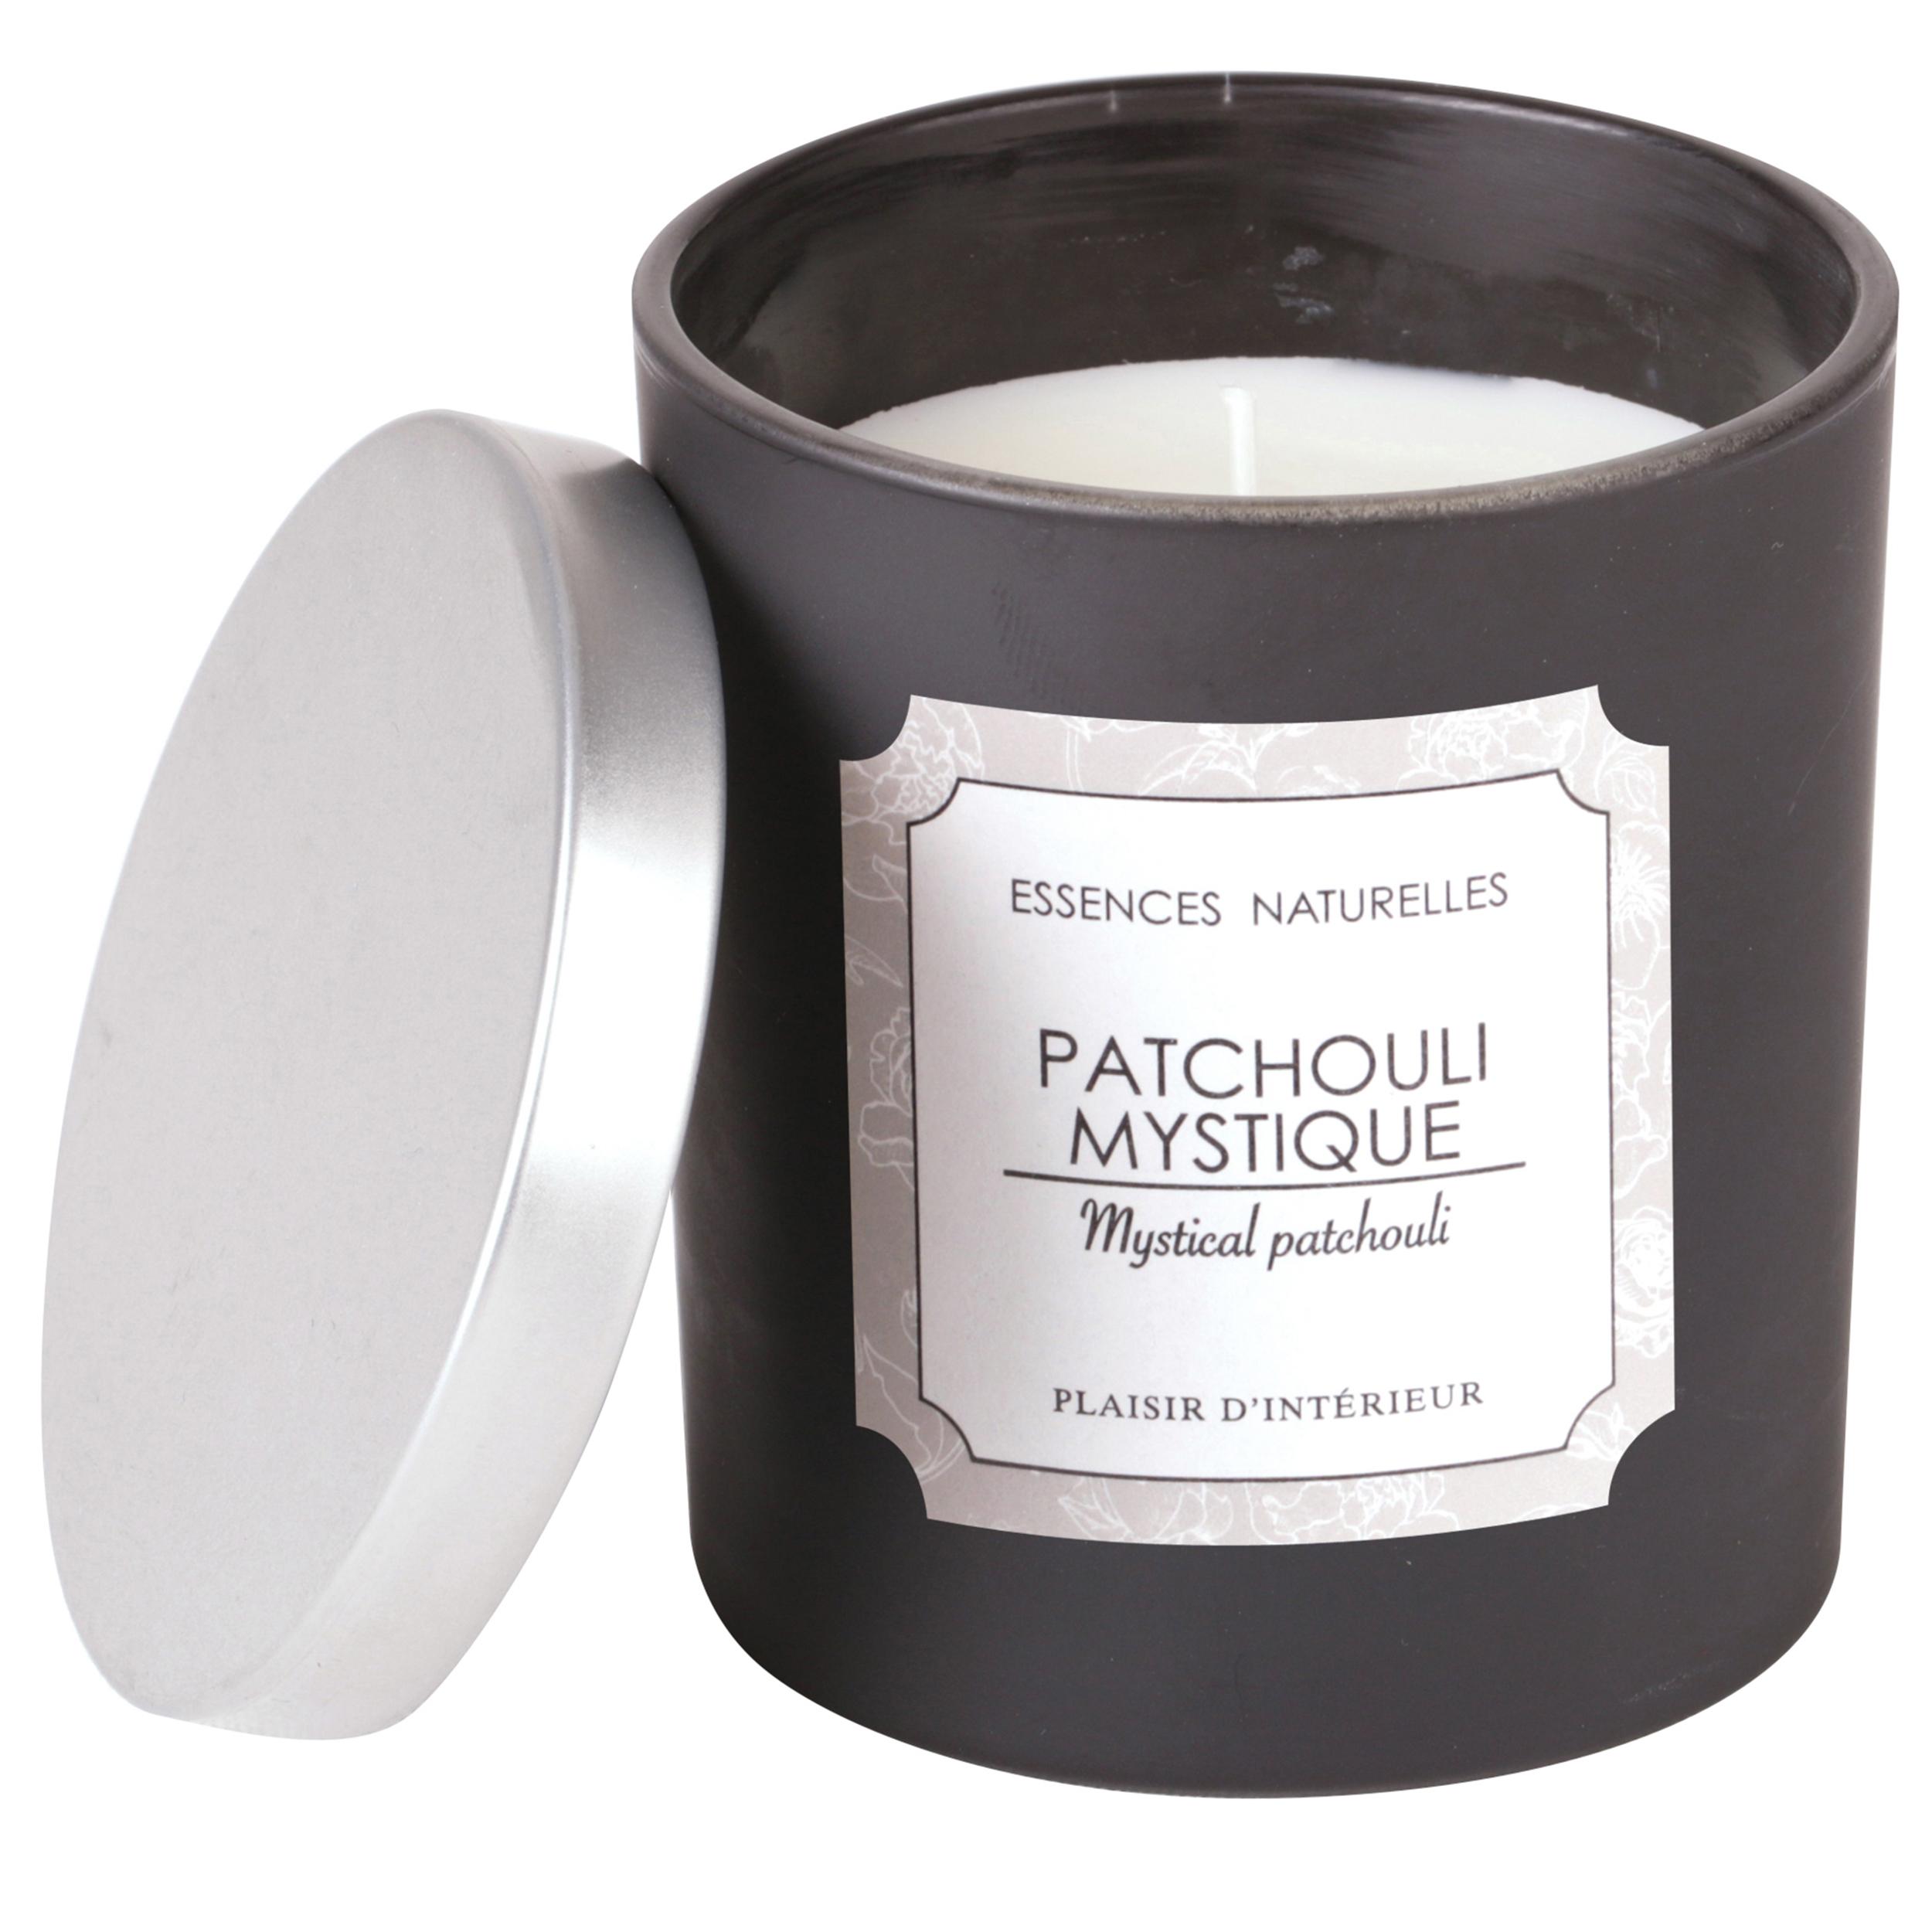 BOUGIE PARFUMEE PATCHOULI MYSTIQUE (S)